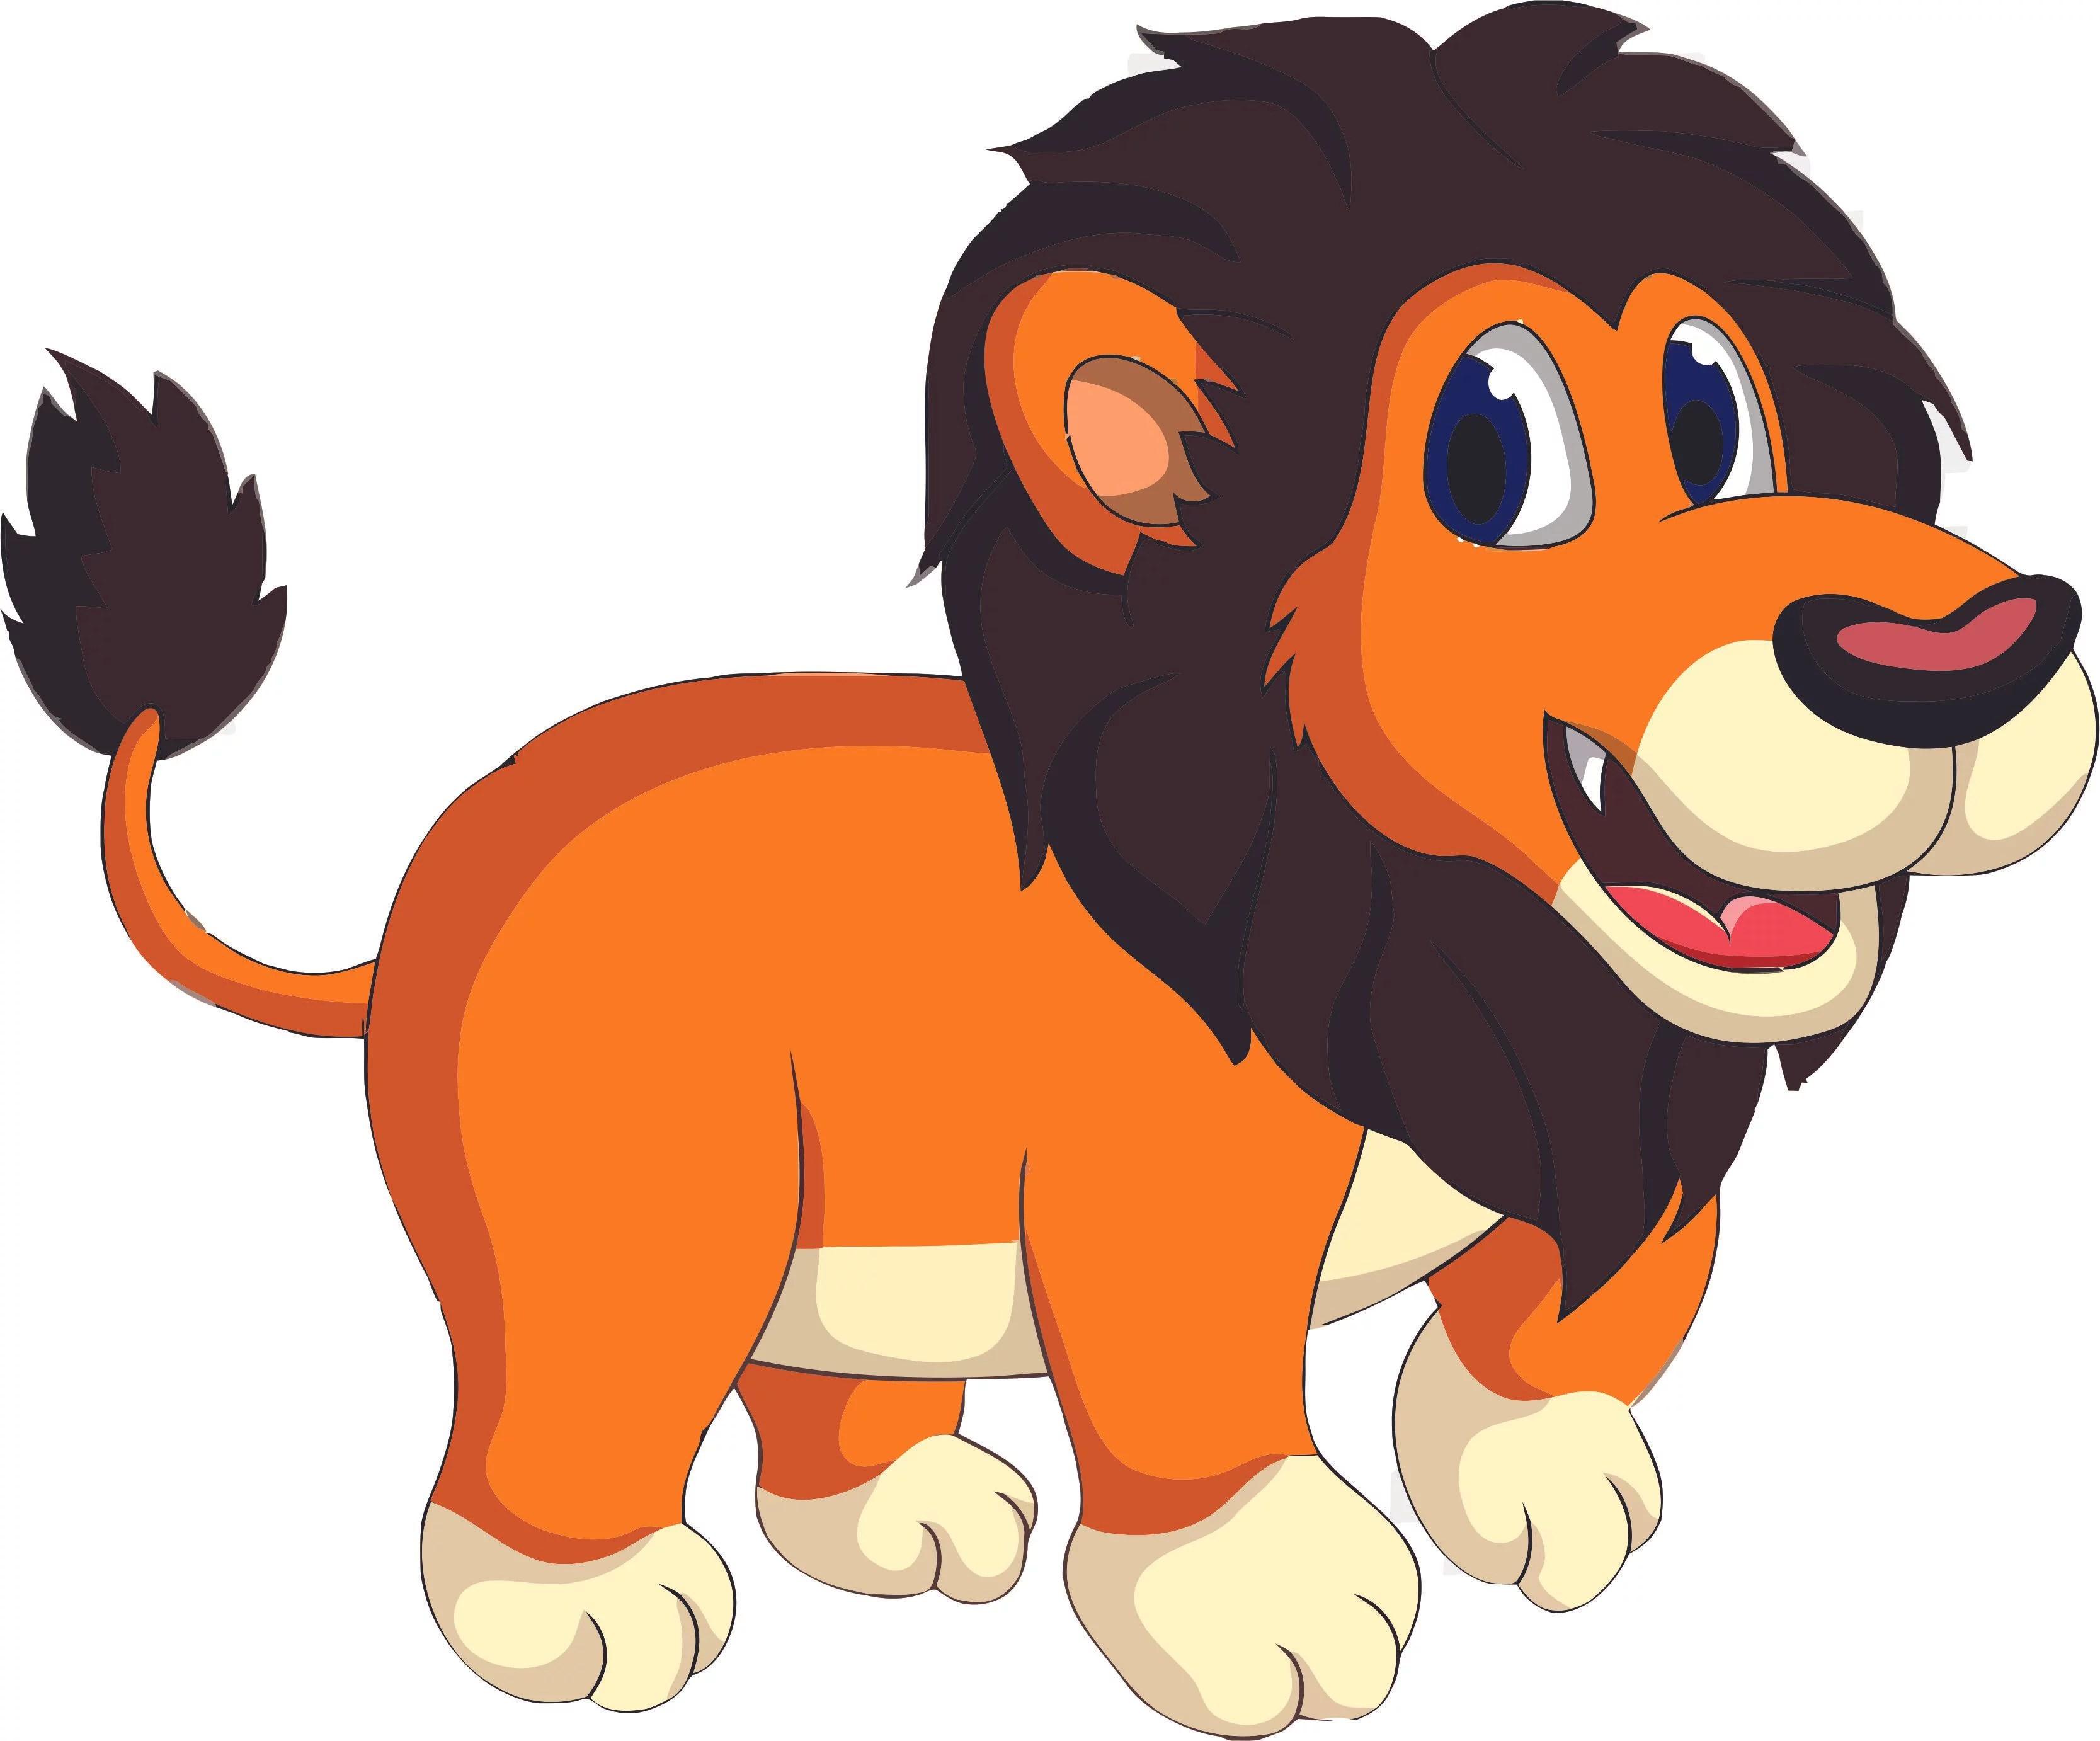 Lion Lions Of The Jungle Zoo Safari Wild Animals Cartoon Design Wall Decals For Nursery Bedroom Bathroom Animal Animals Children S Decorations Kids Vinyl Art Decal Walls Rooms Size 12x20 Inch Walmart Com